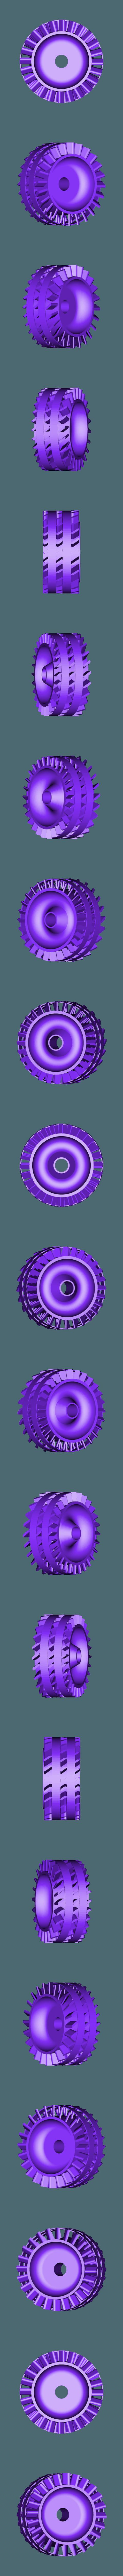 LPC-Rotor901ws.stl Download free STL file Jet Engine; Geared Turbofan (GTF), Modified Parts • 3D print template, konchan77